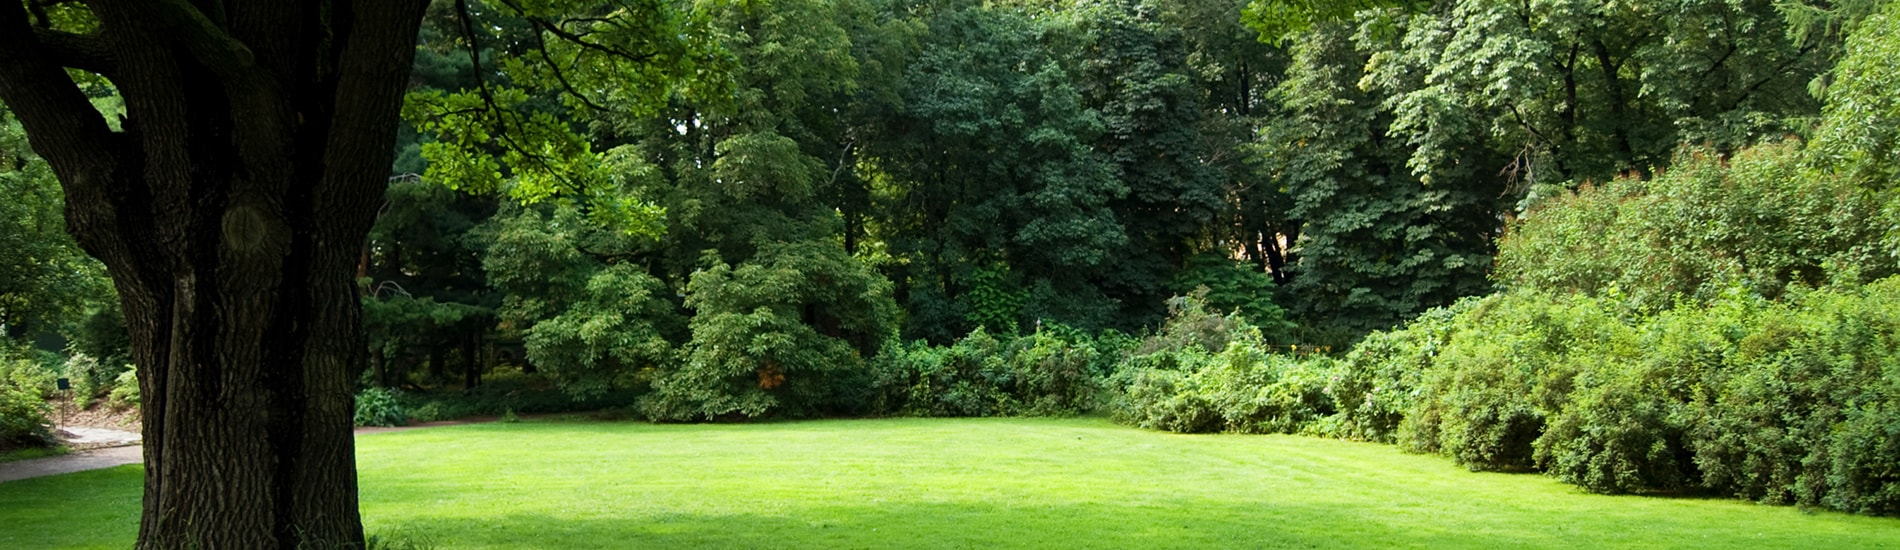 tree-services-slider1